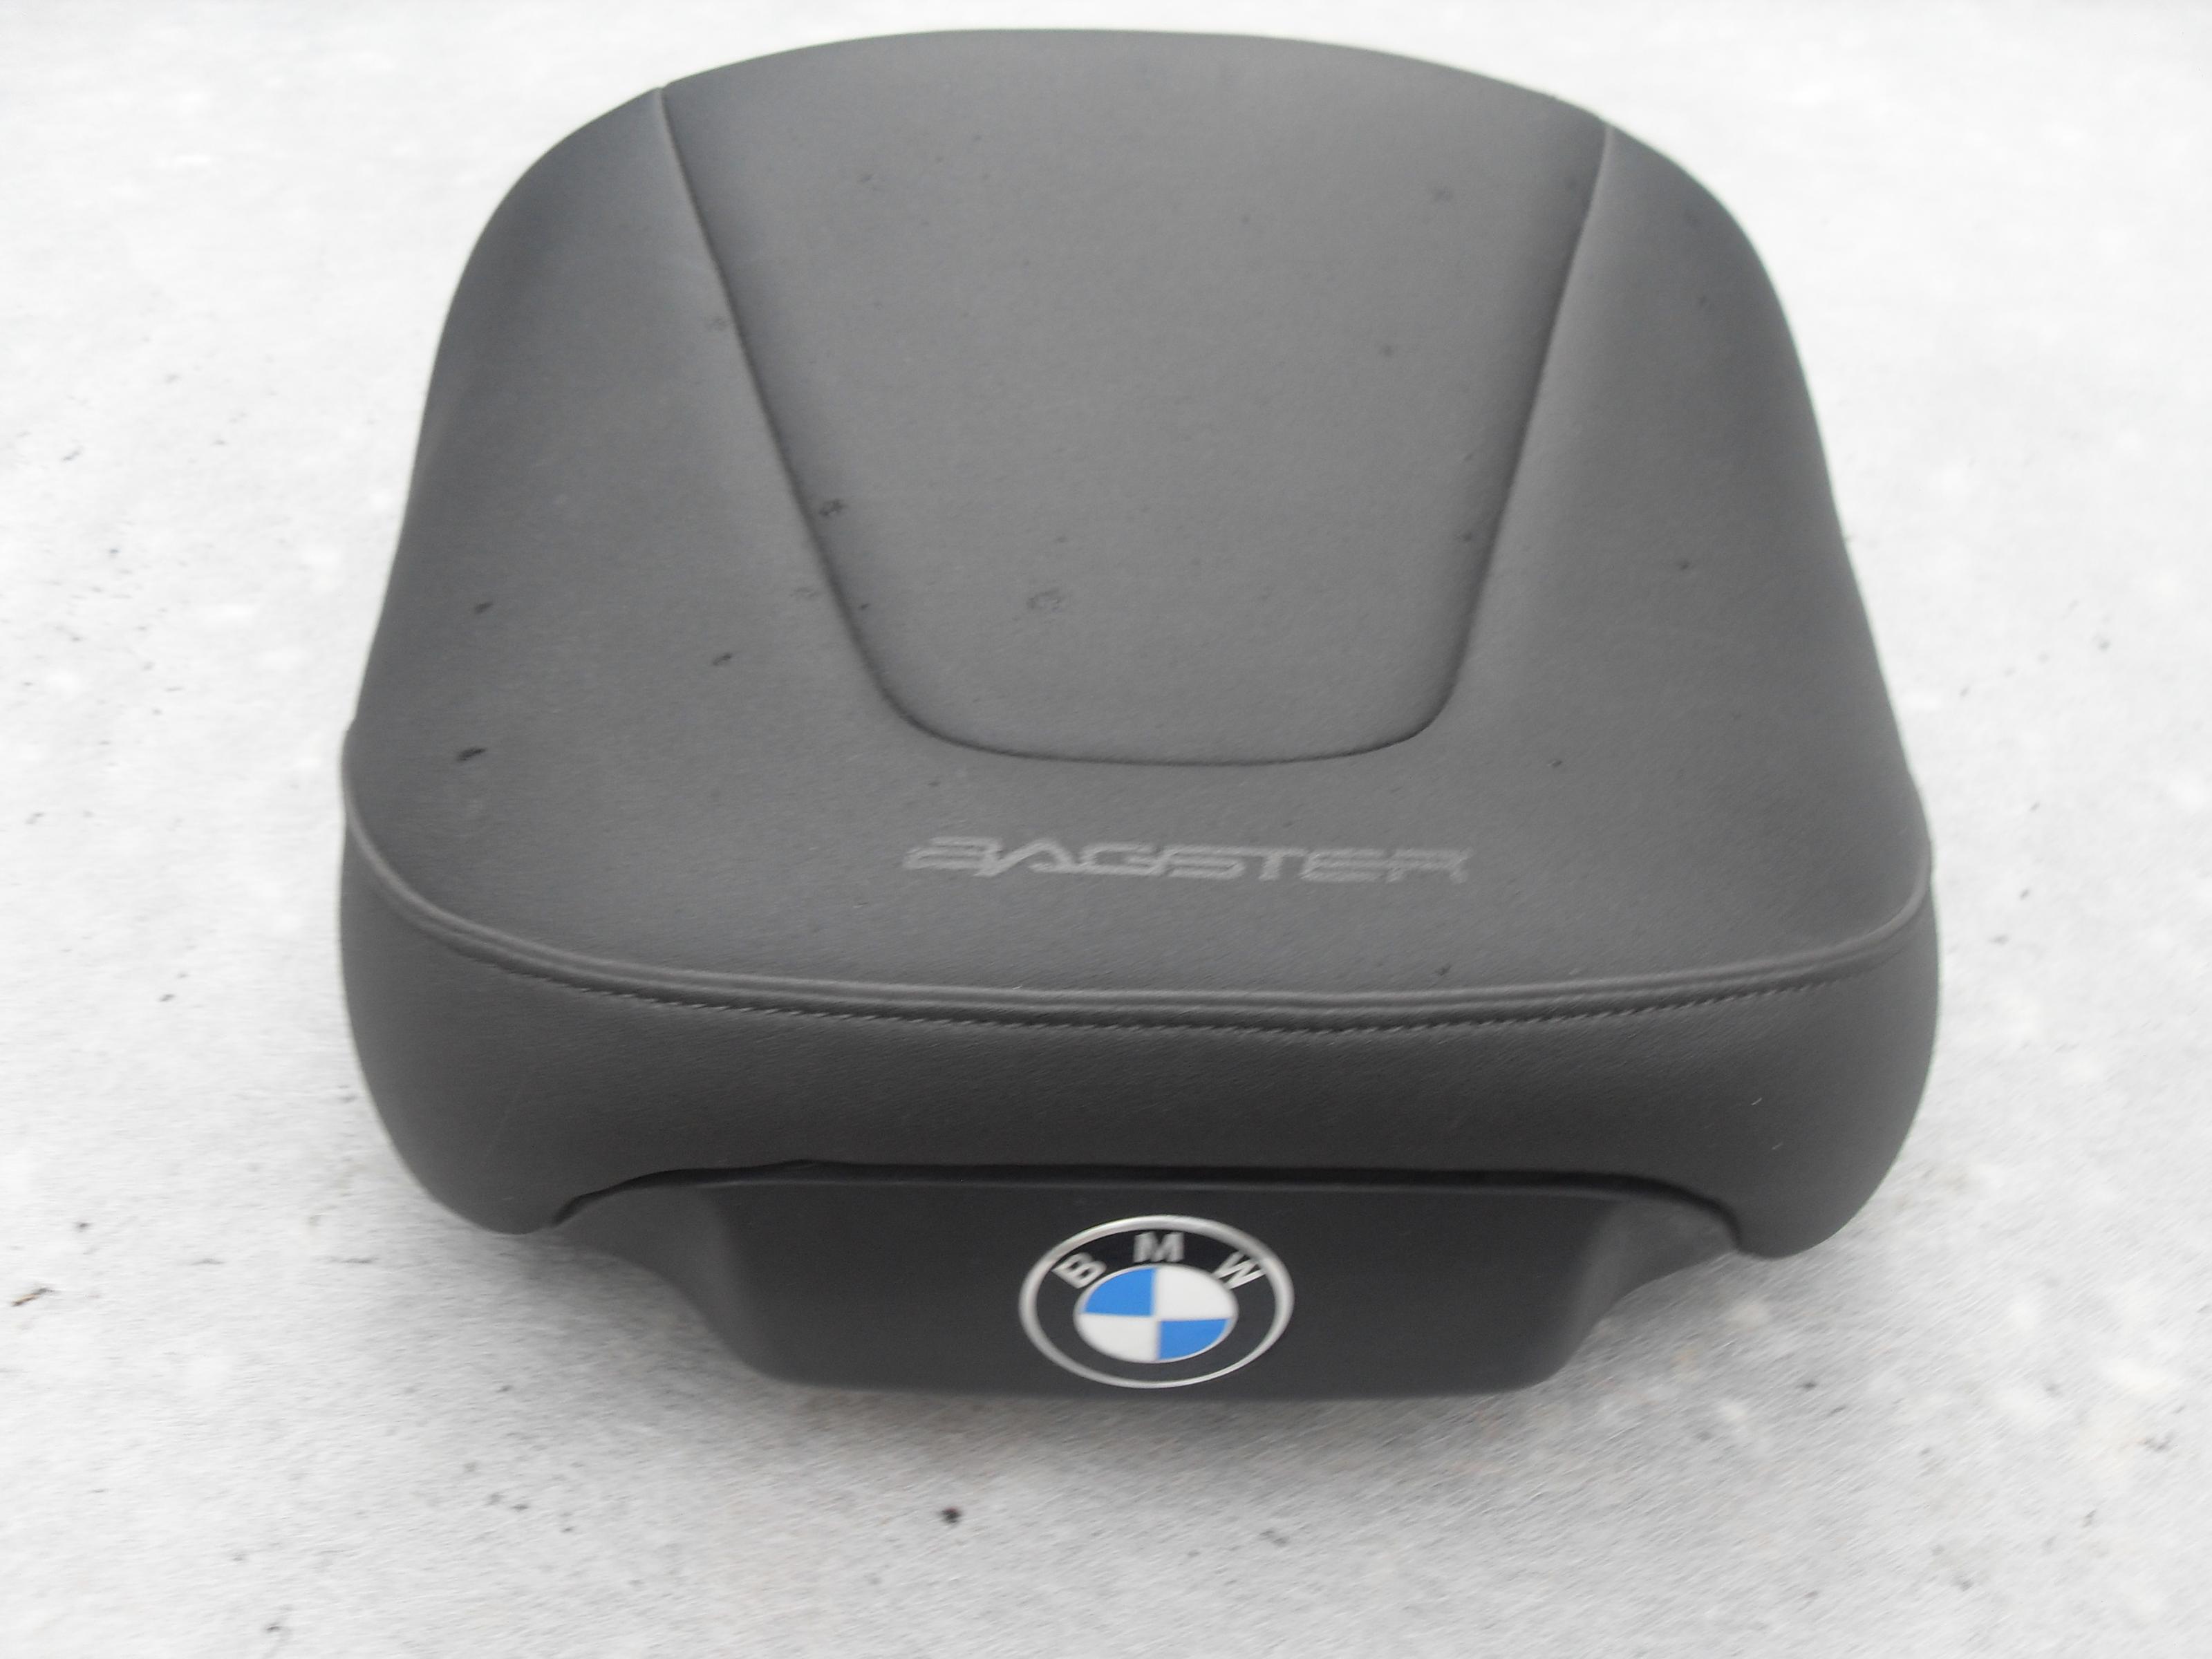 biete r 1150 gs adventure original bagster fahrersitz. Black Bedroom Furniture Sets. Home Design Ideas